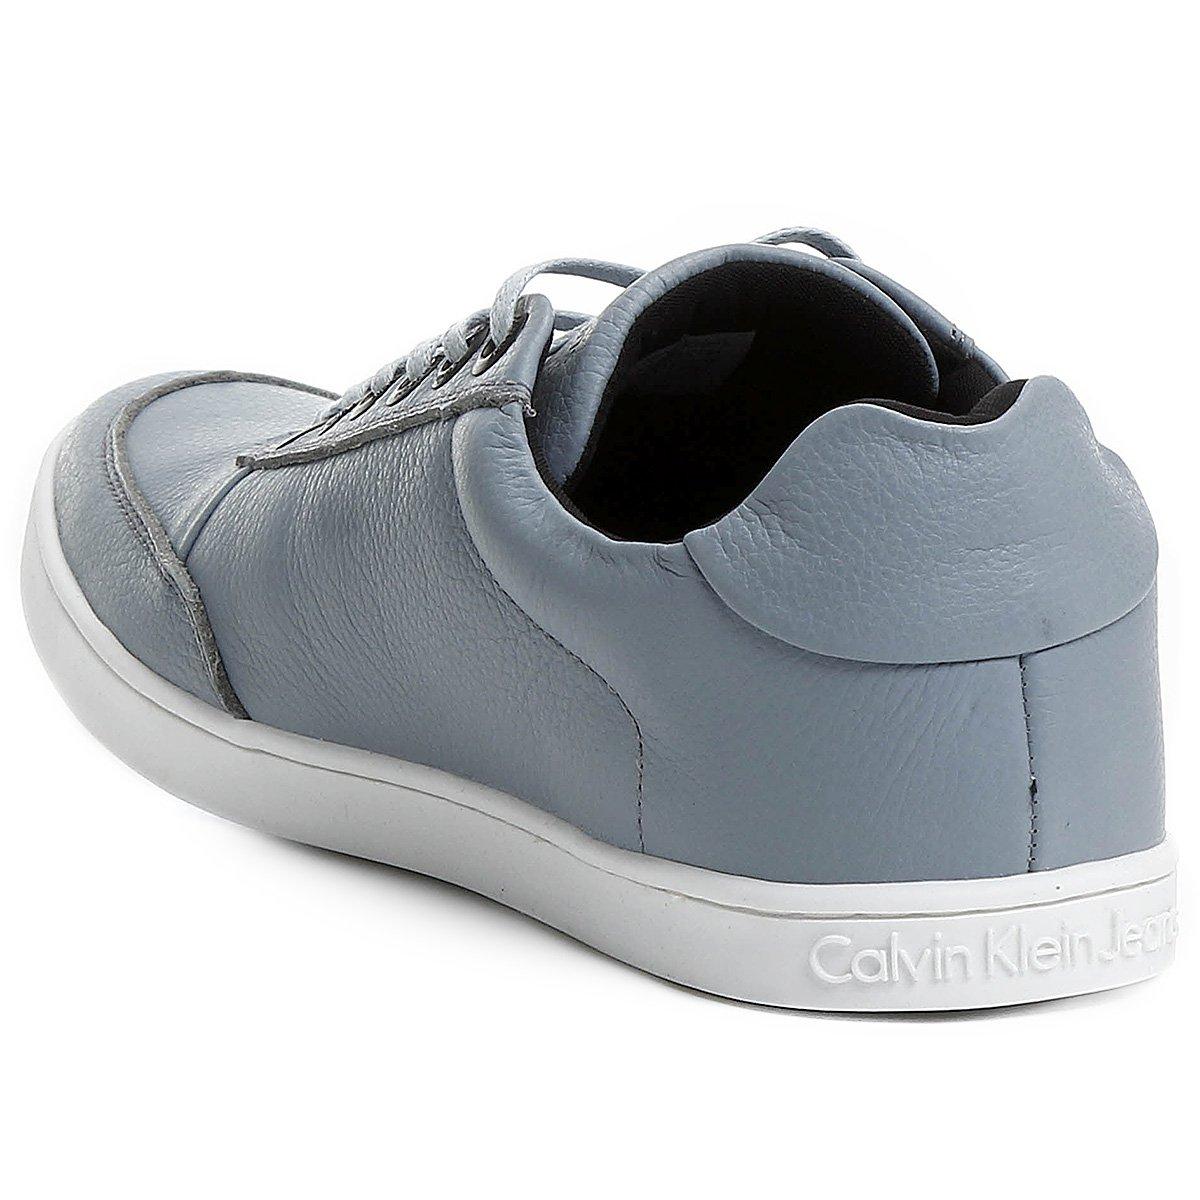 Sapatênis Calvin Klein Boat Leather - Compre Agora   Netshoes 65b5b02dac